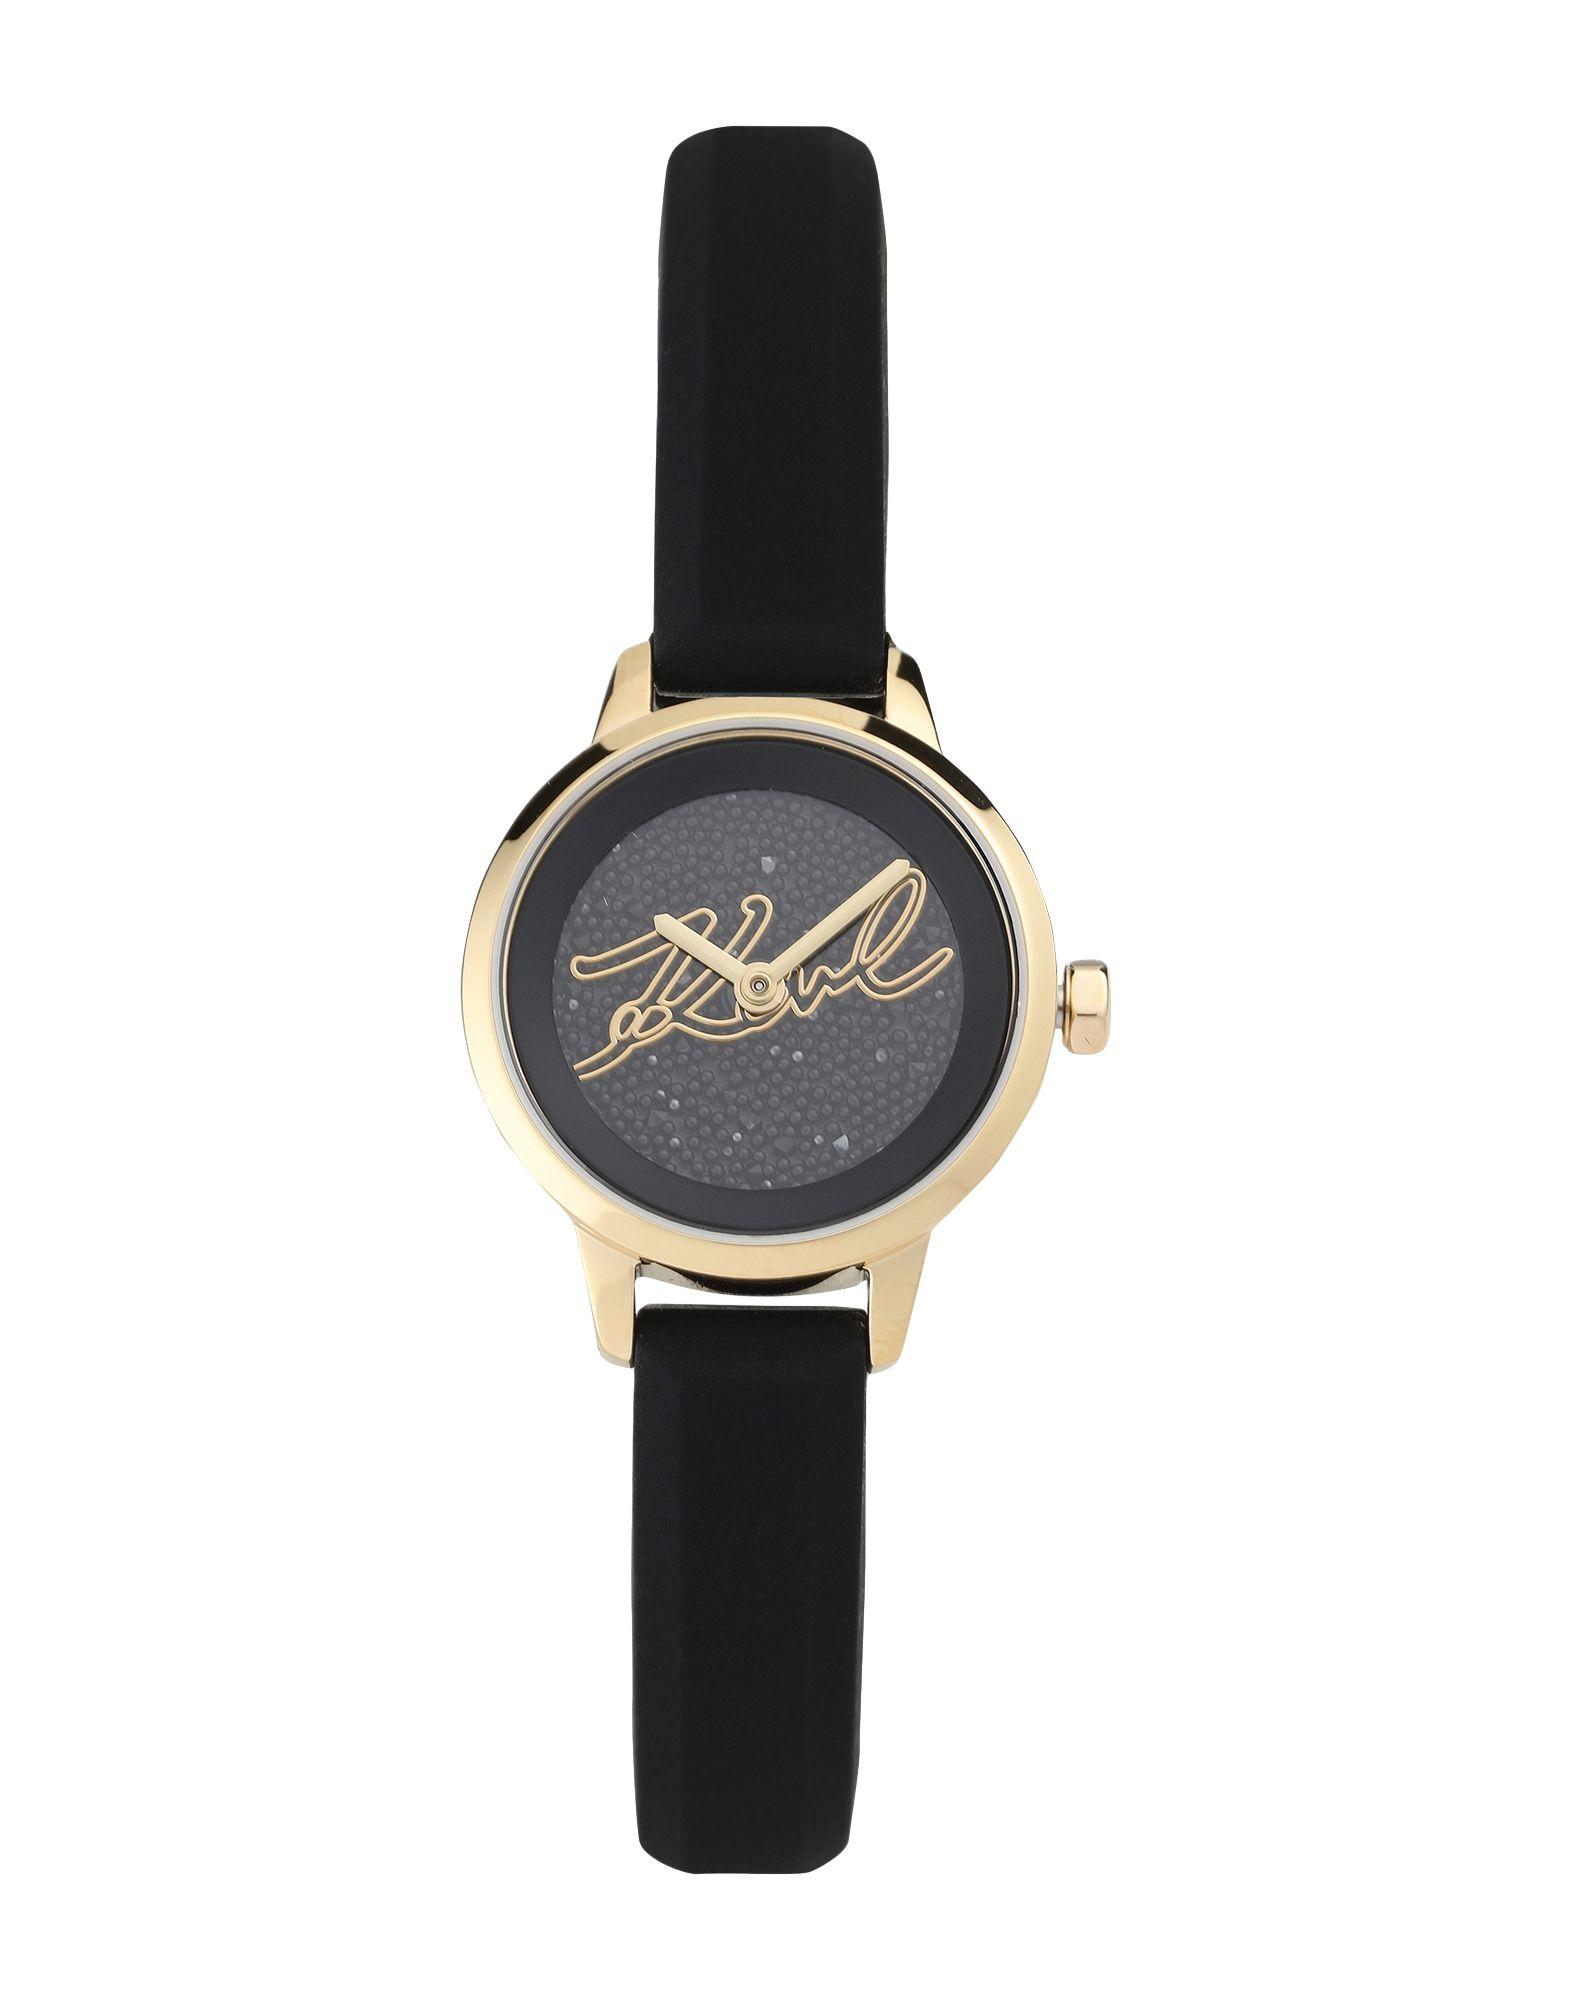 KARL LAGERFELD Wrist watches - Item 50237929